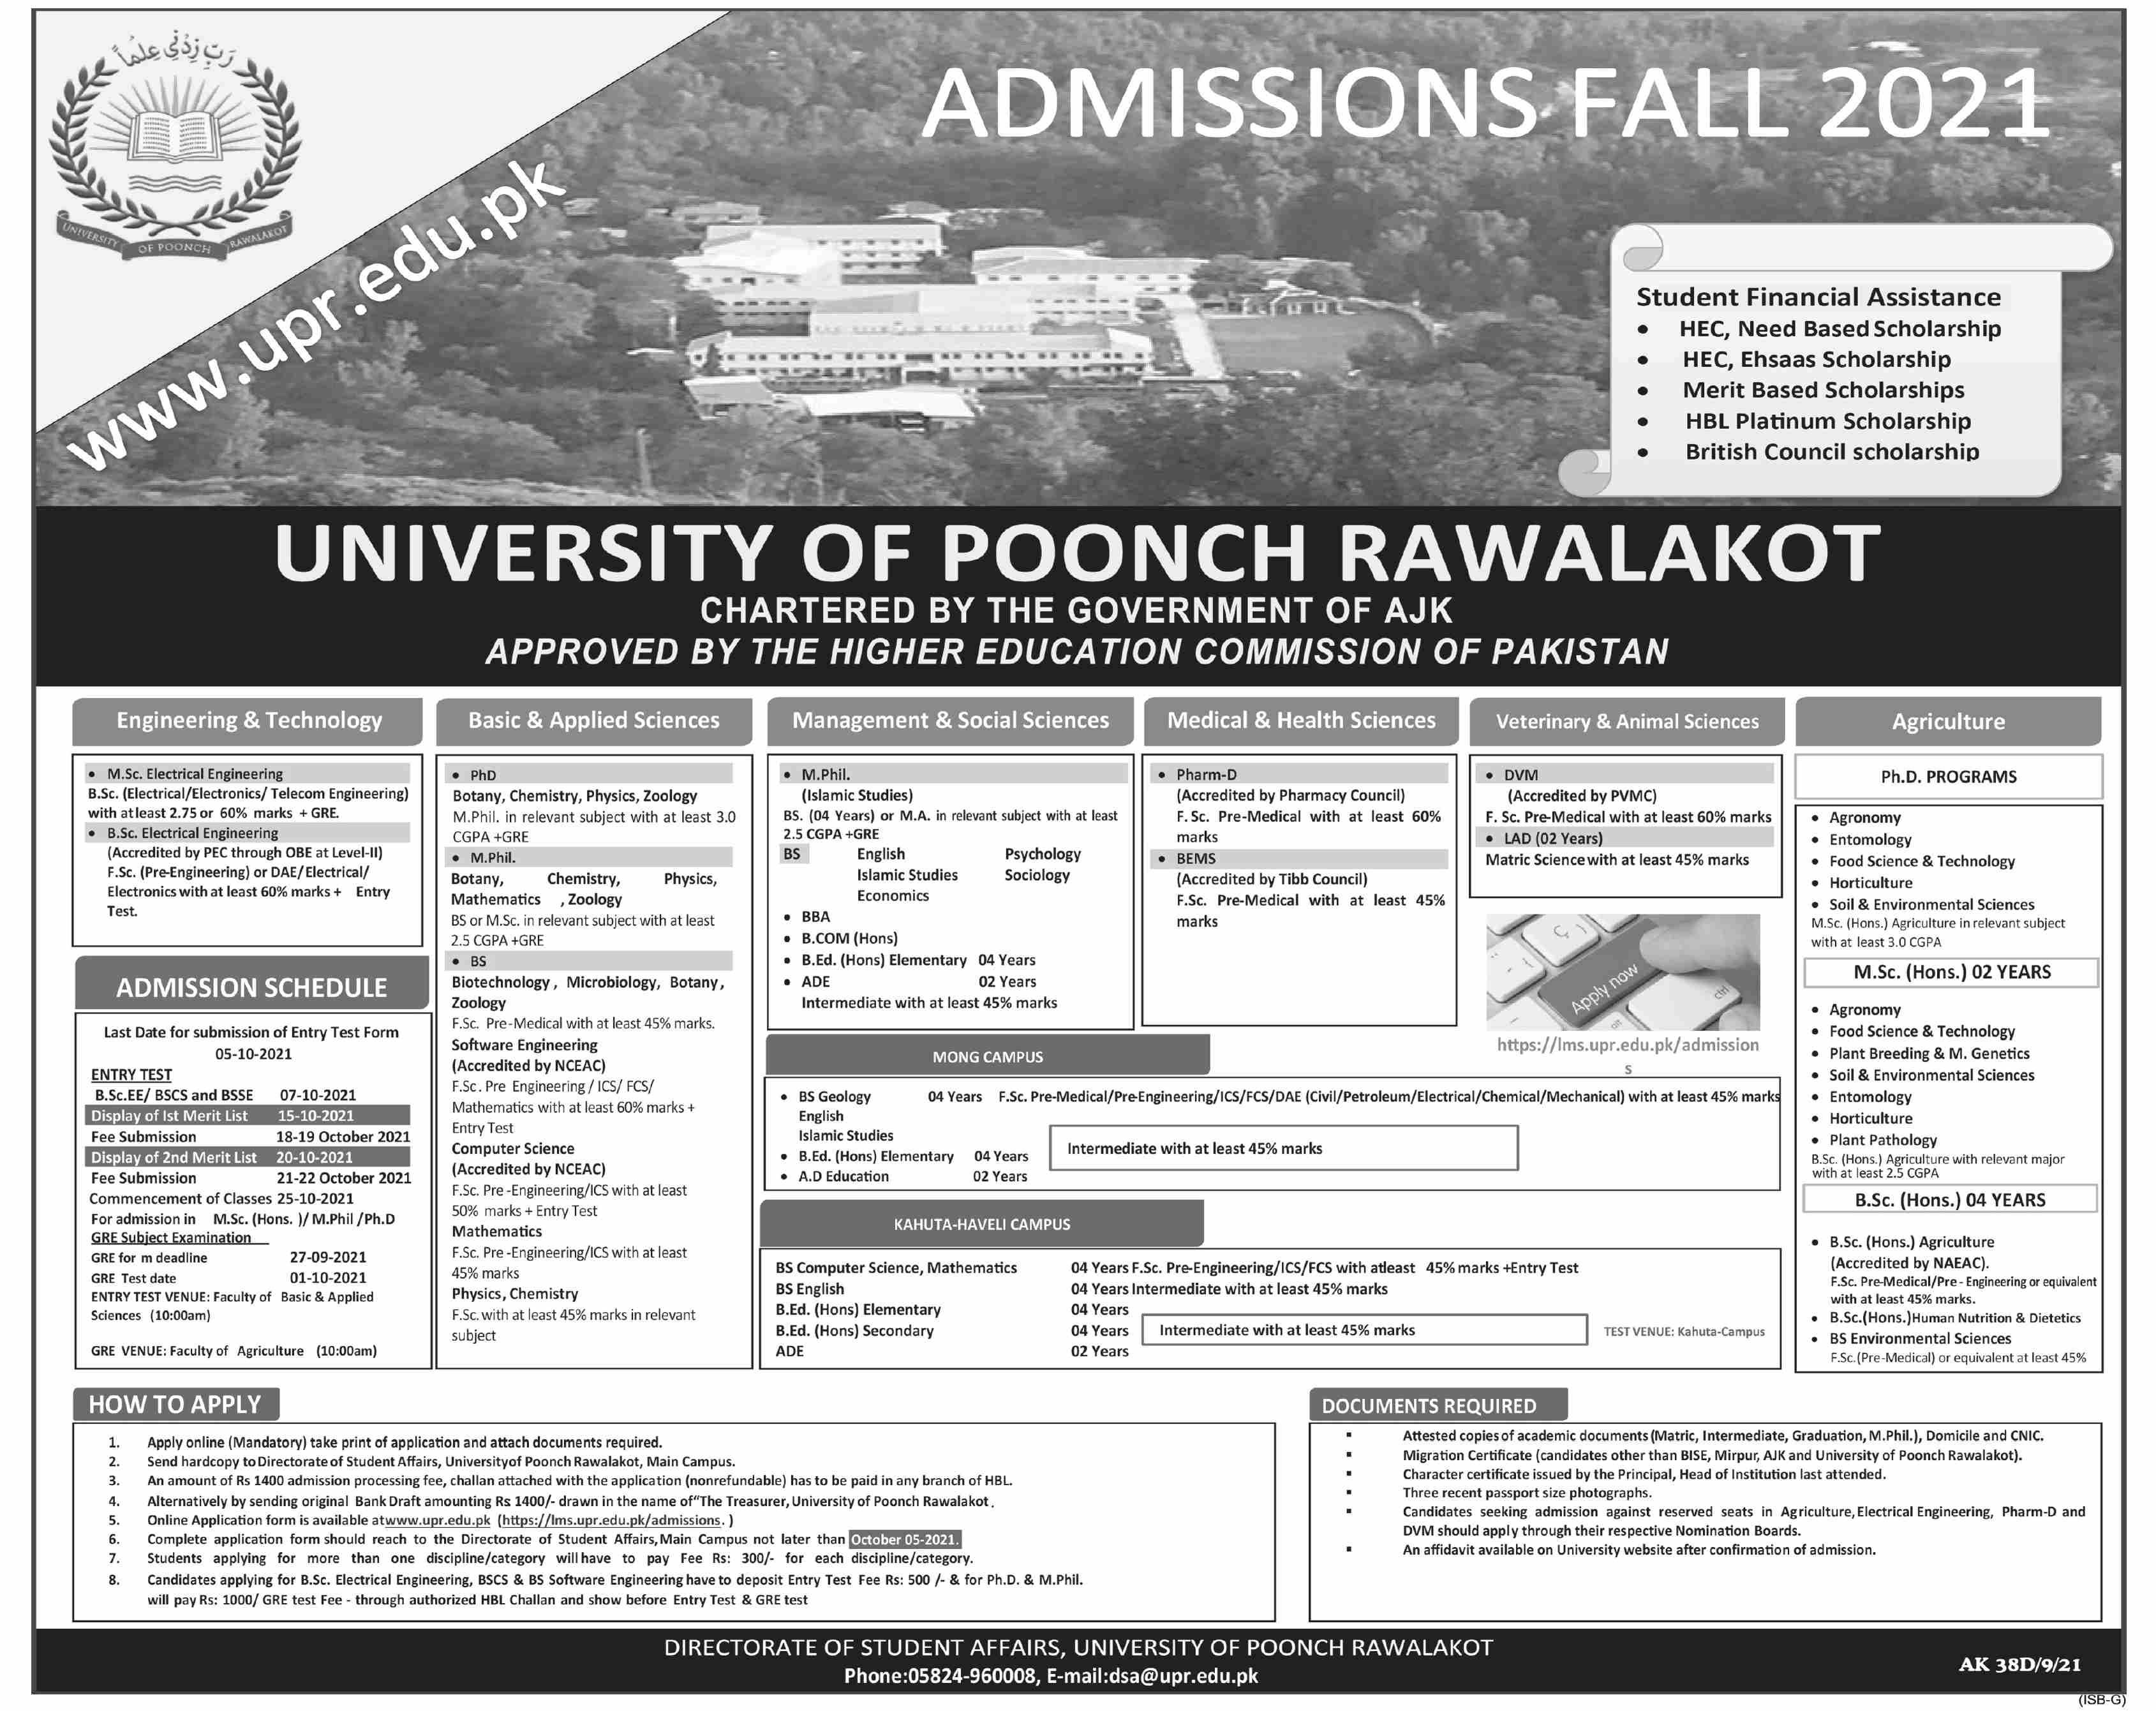 University Of Poonch Rawalakot Admissions